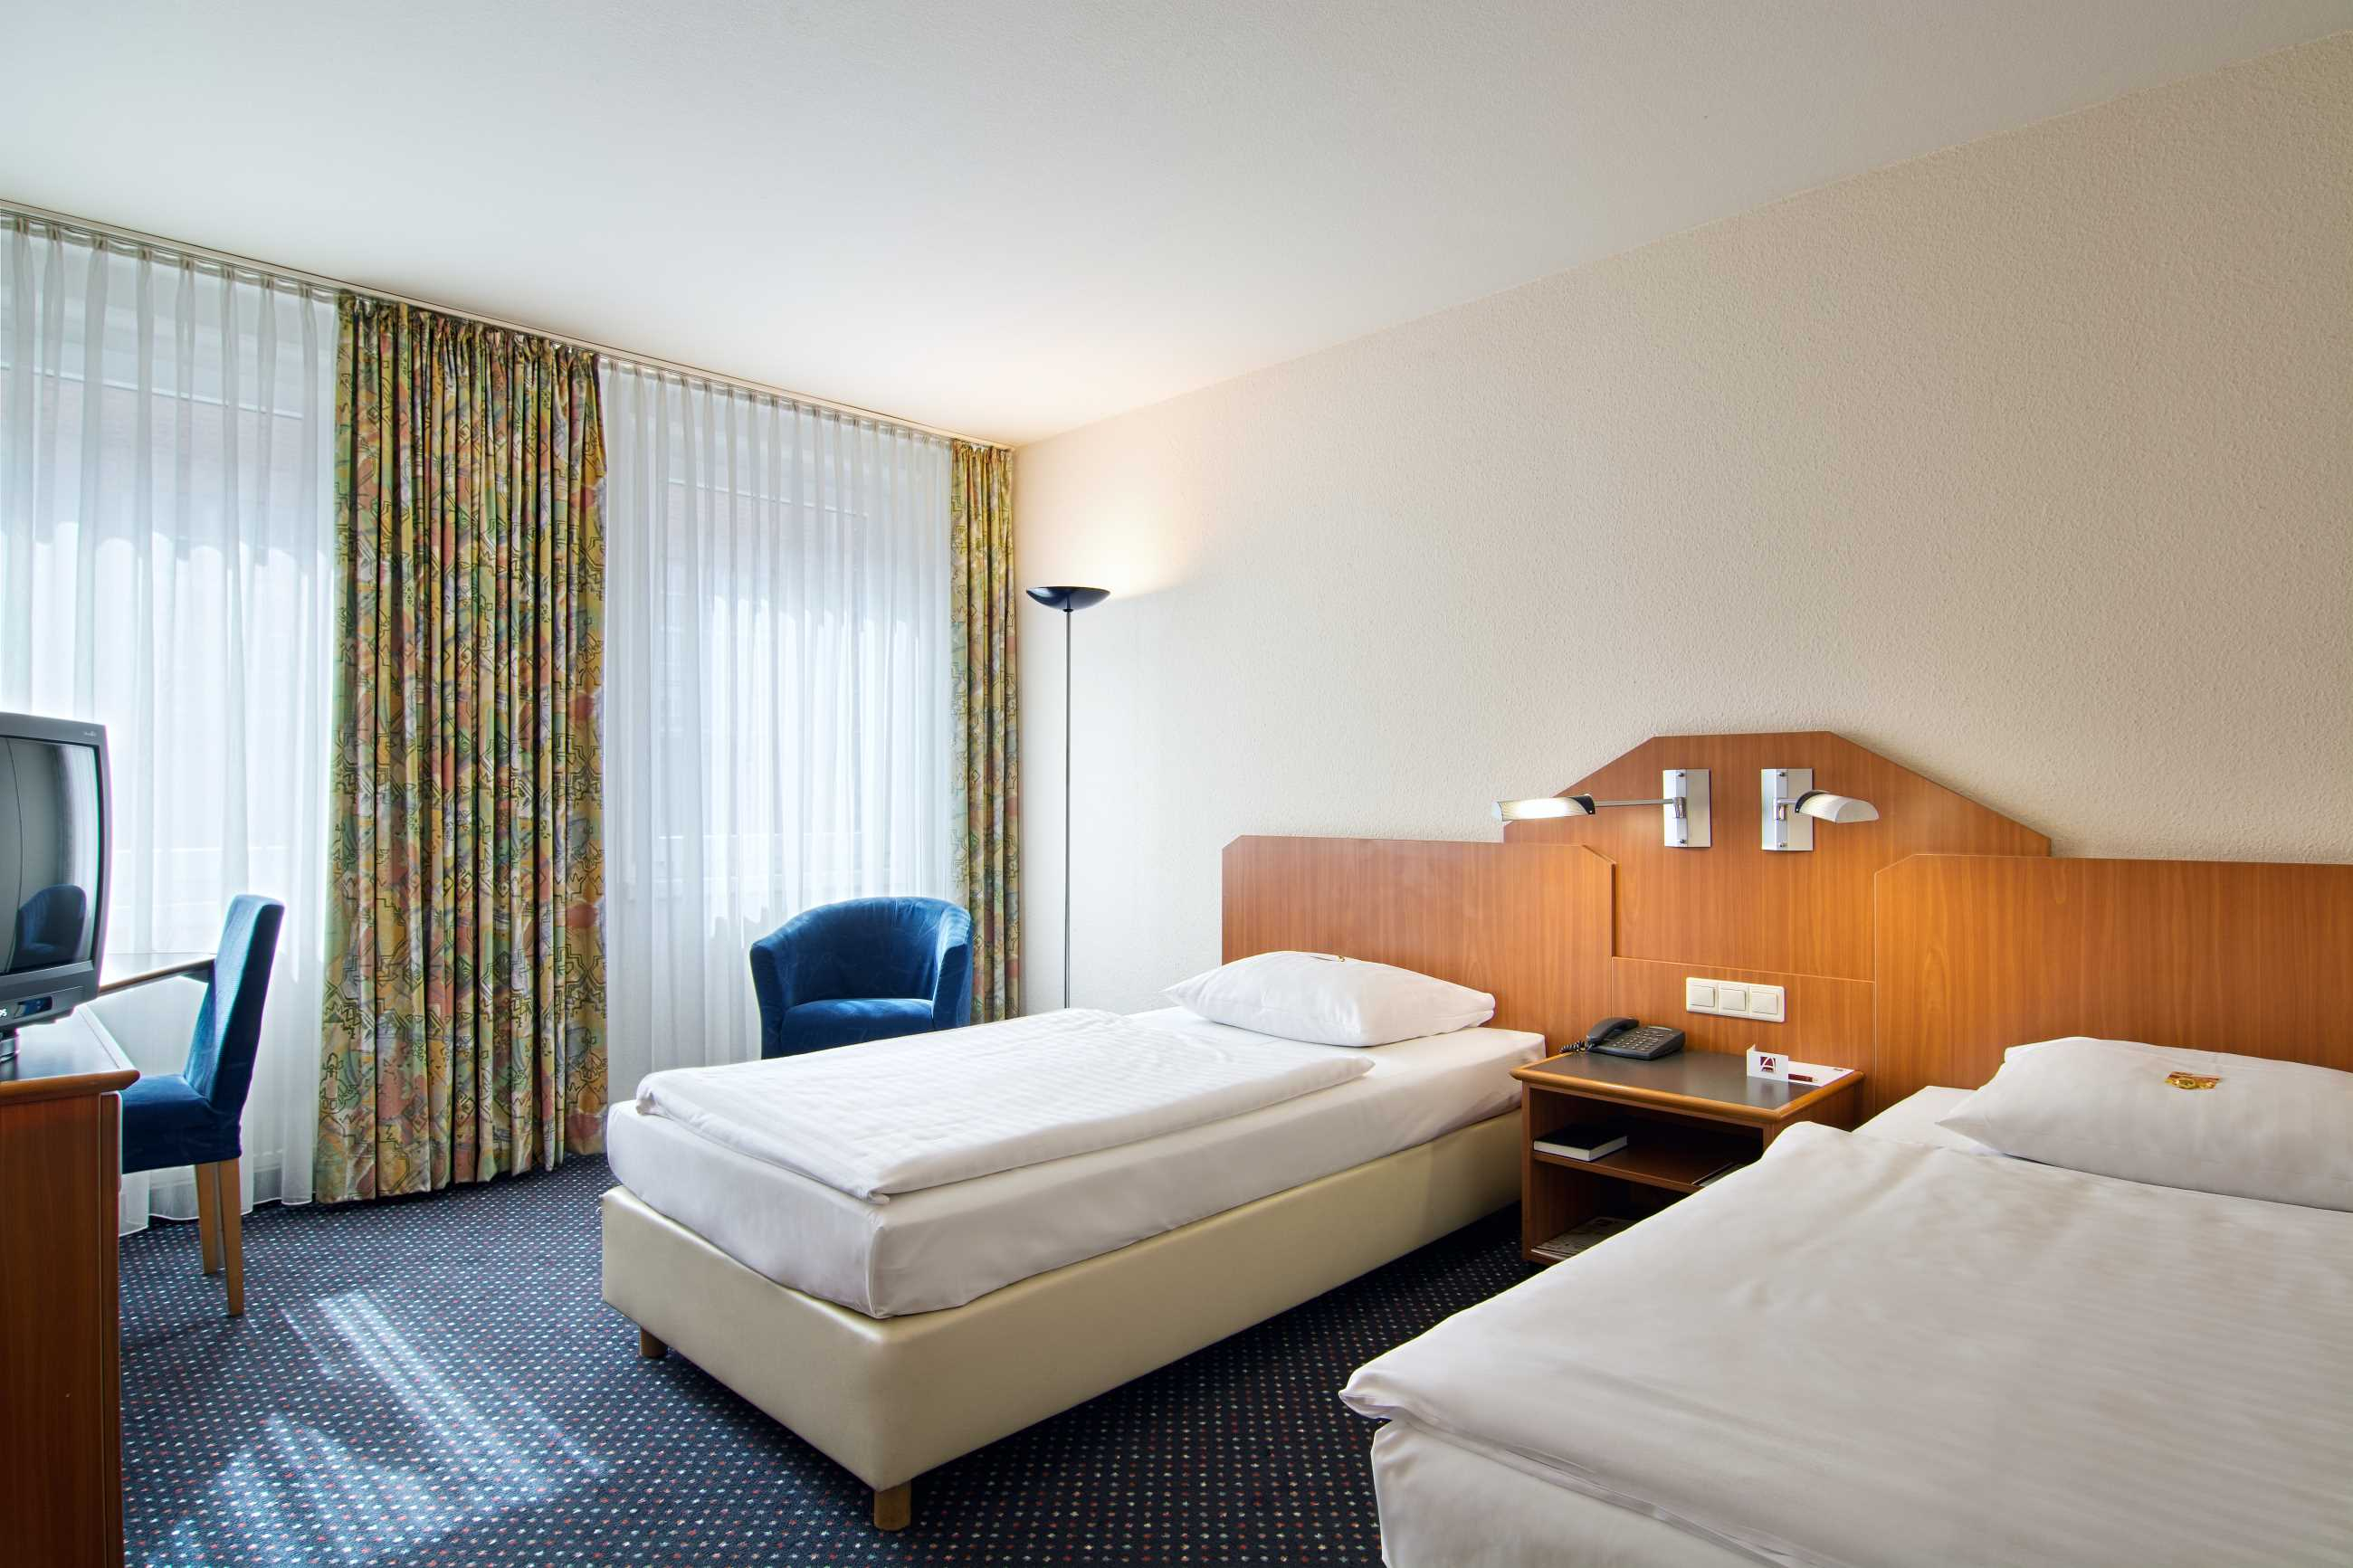 arcadia_hotel_bielefeld_zimmer